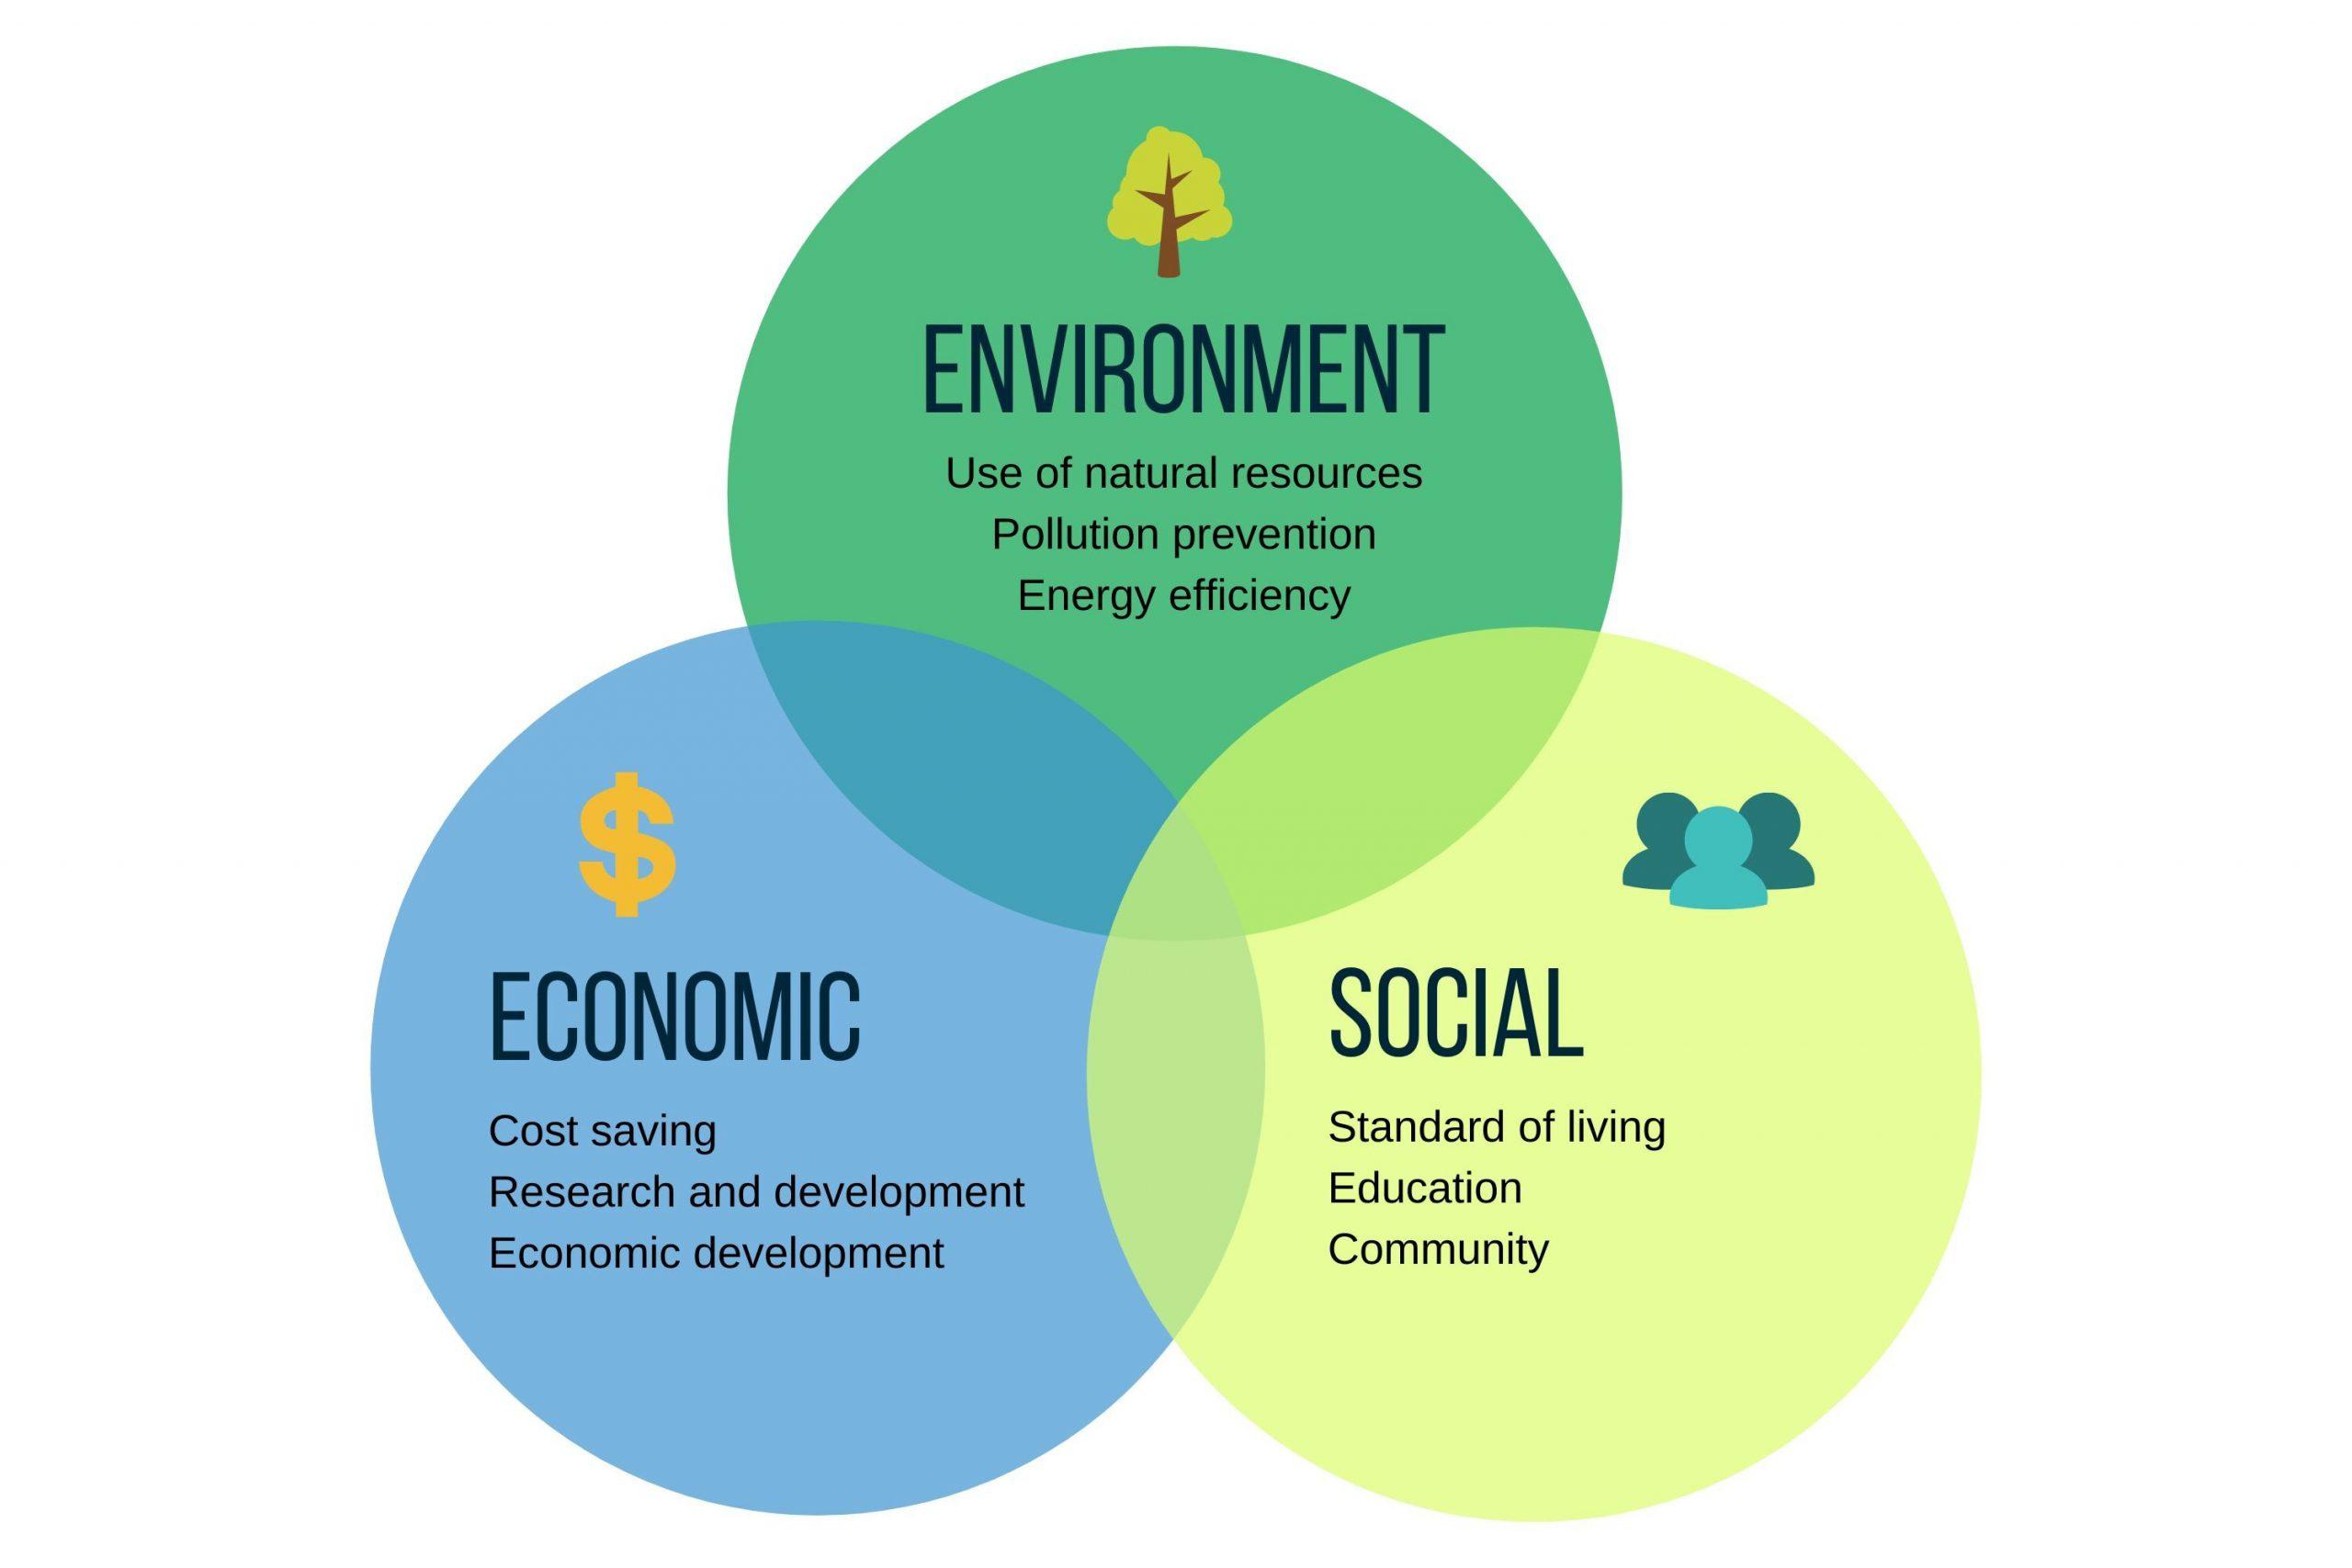 Pillars of tourism sustainability